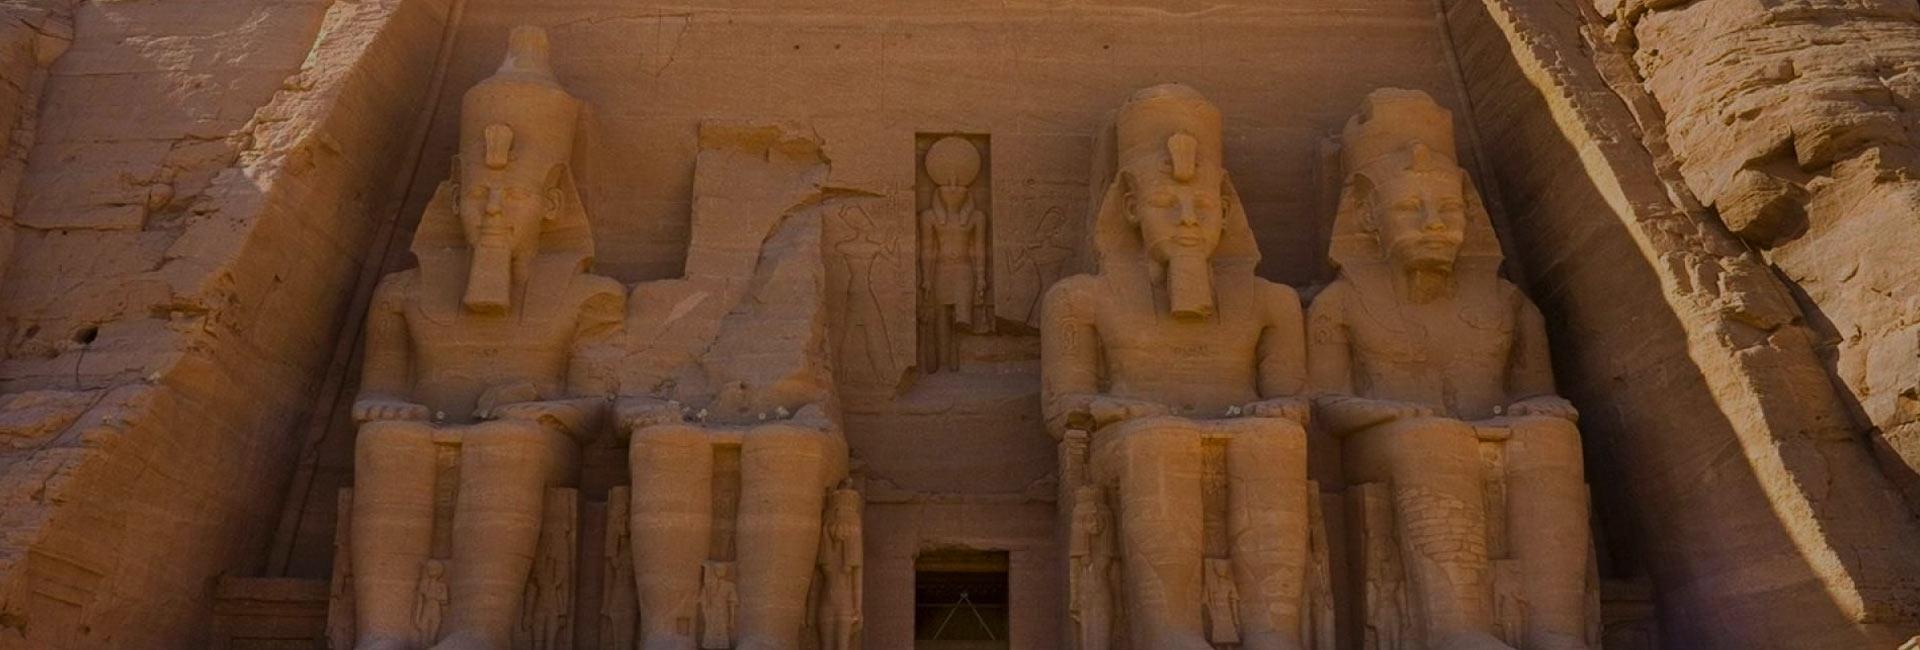 Luxor And Abu Simbel Tour From Hurghada